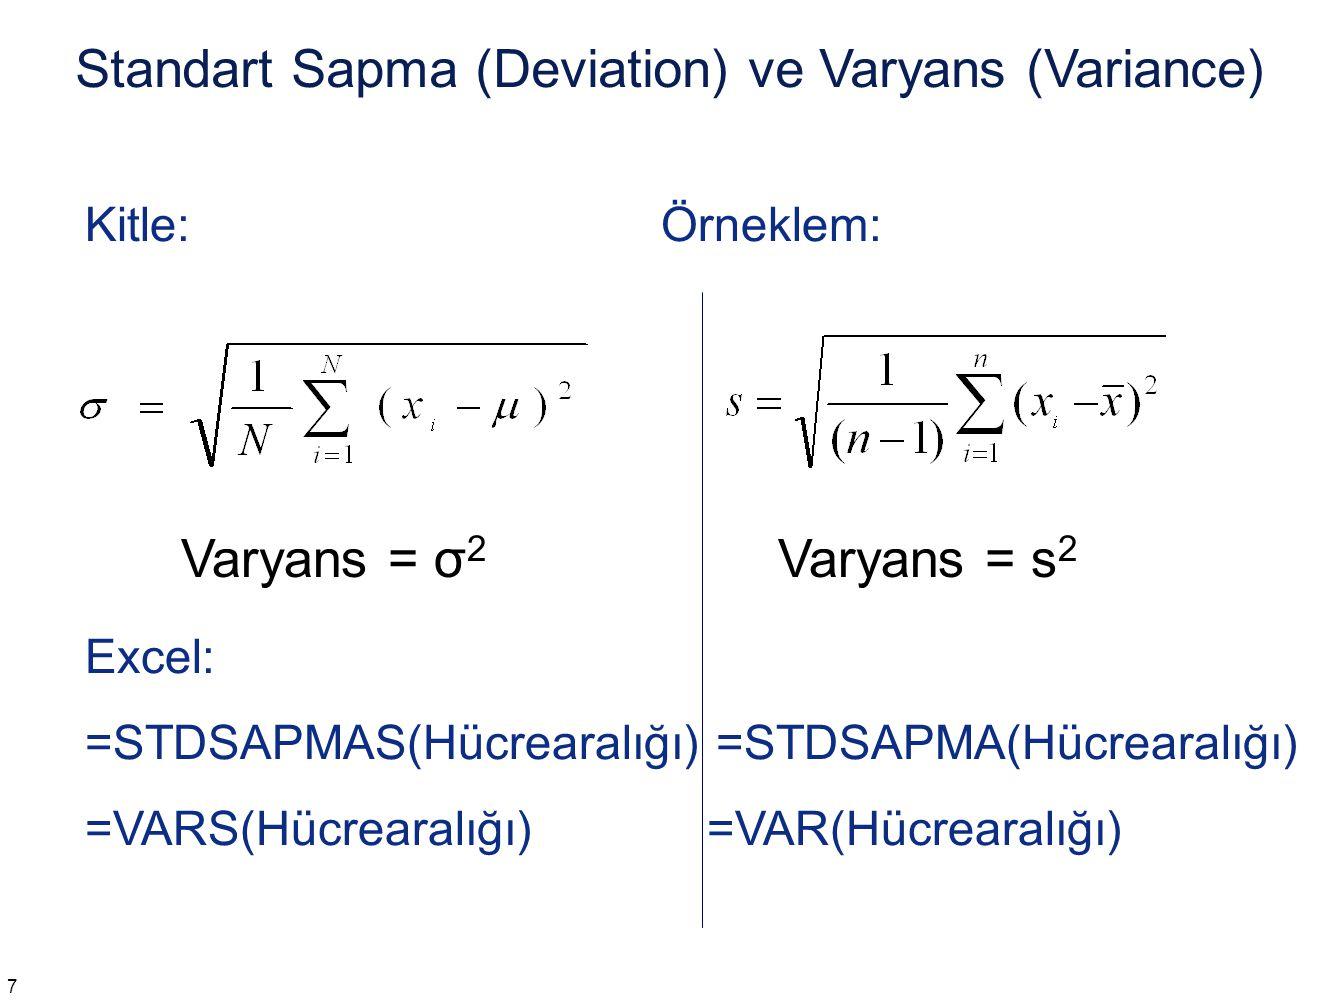 Kitle: Örneklem: Excel: =STDSAPMAS(Hücrearalığı) =STDSAPMA(Hücrearalığı) =VARS(Hücrearalığı) =VAR(Hücrearalığı) Standart Sapma (Deviation) ve Varyans